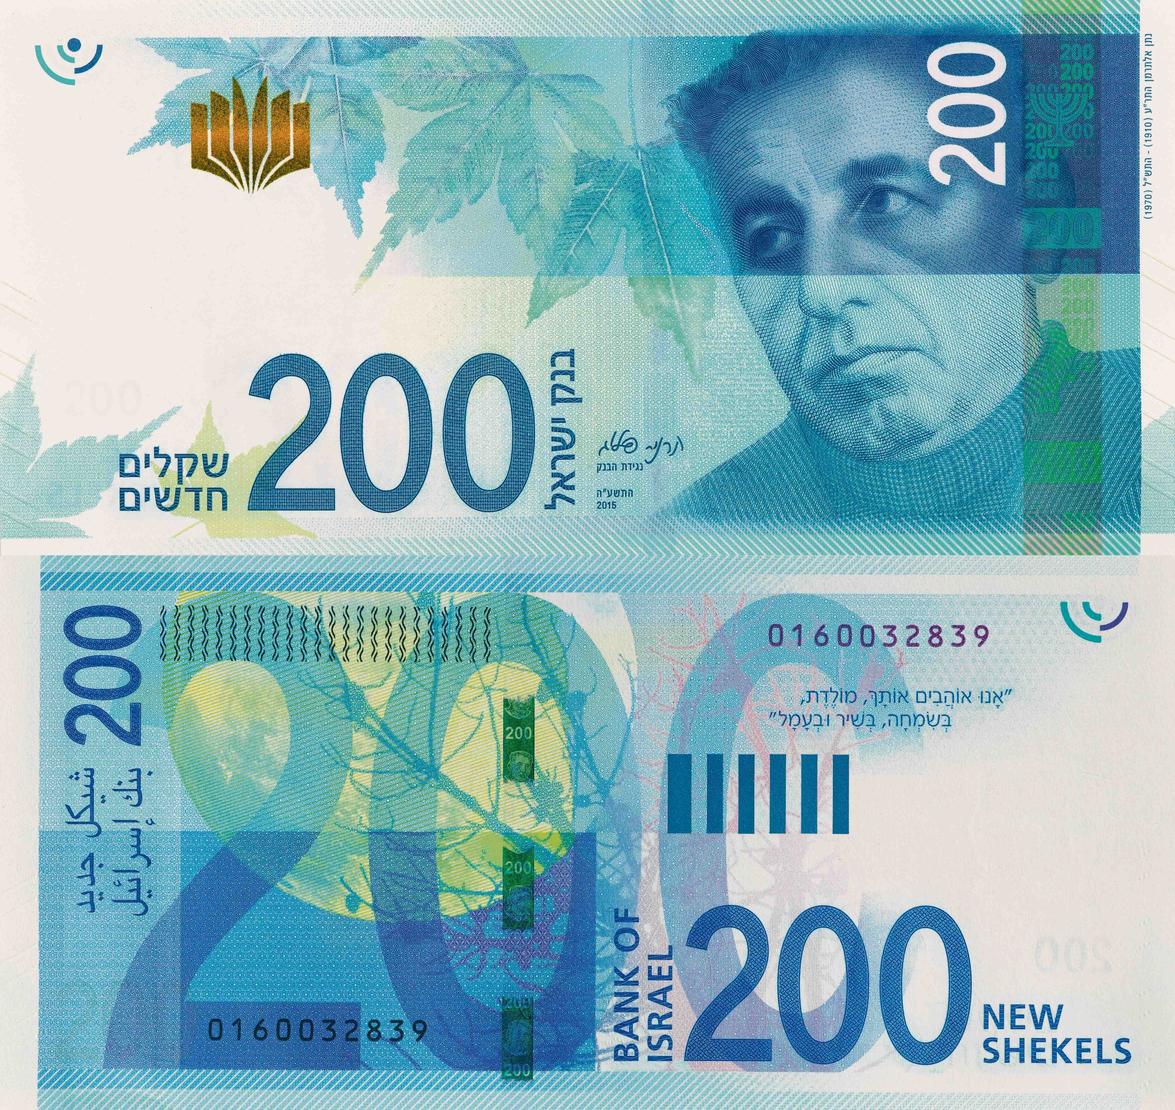 200 New Shekel Banknote